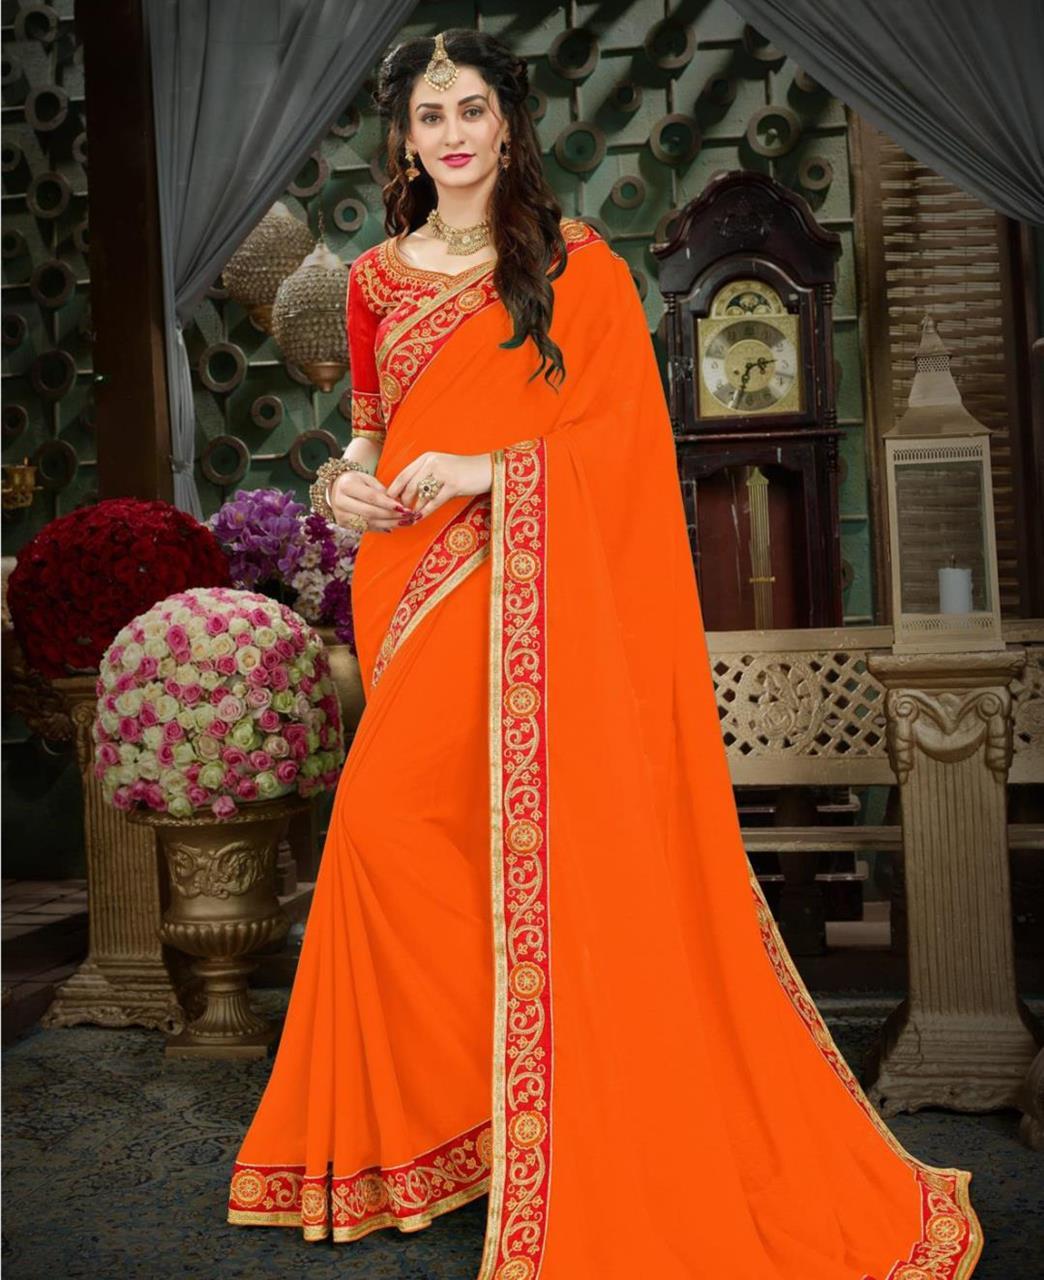 Embroidered Georgette Saree (Sari) in Orange